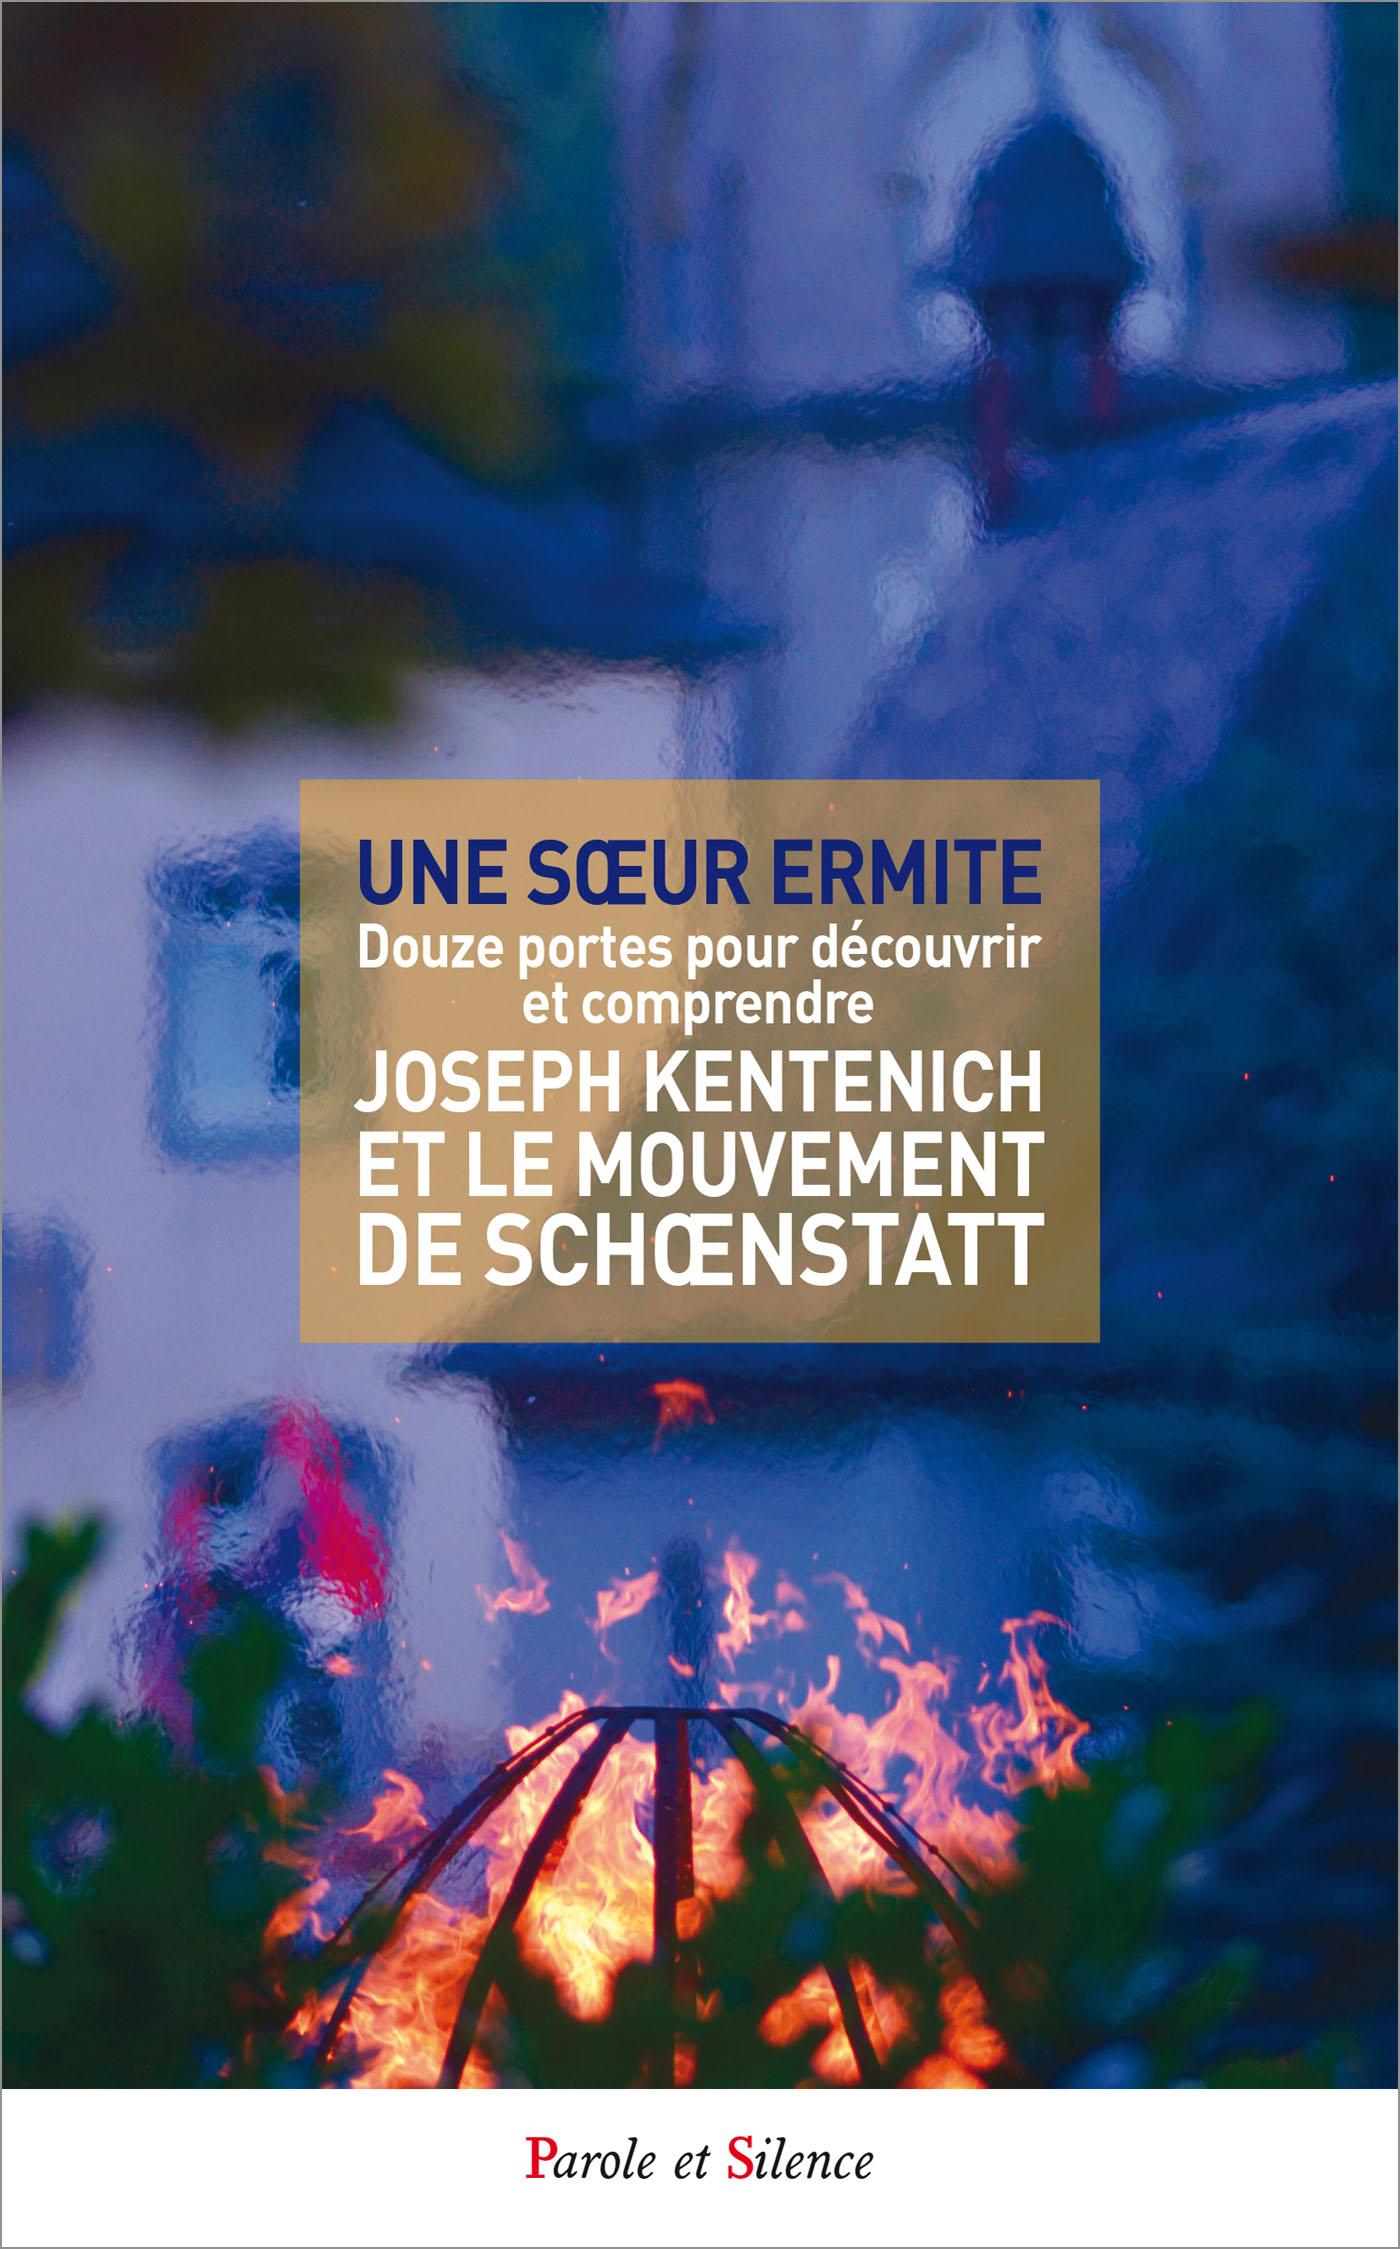 Joseph Kentenich et le mouvement de Schoenstatt